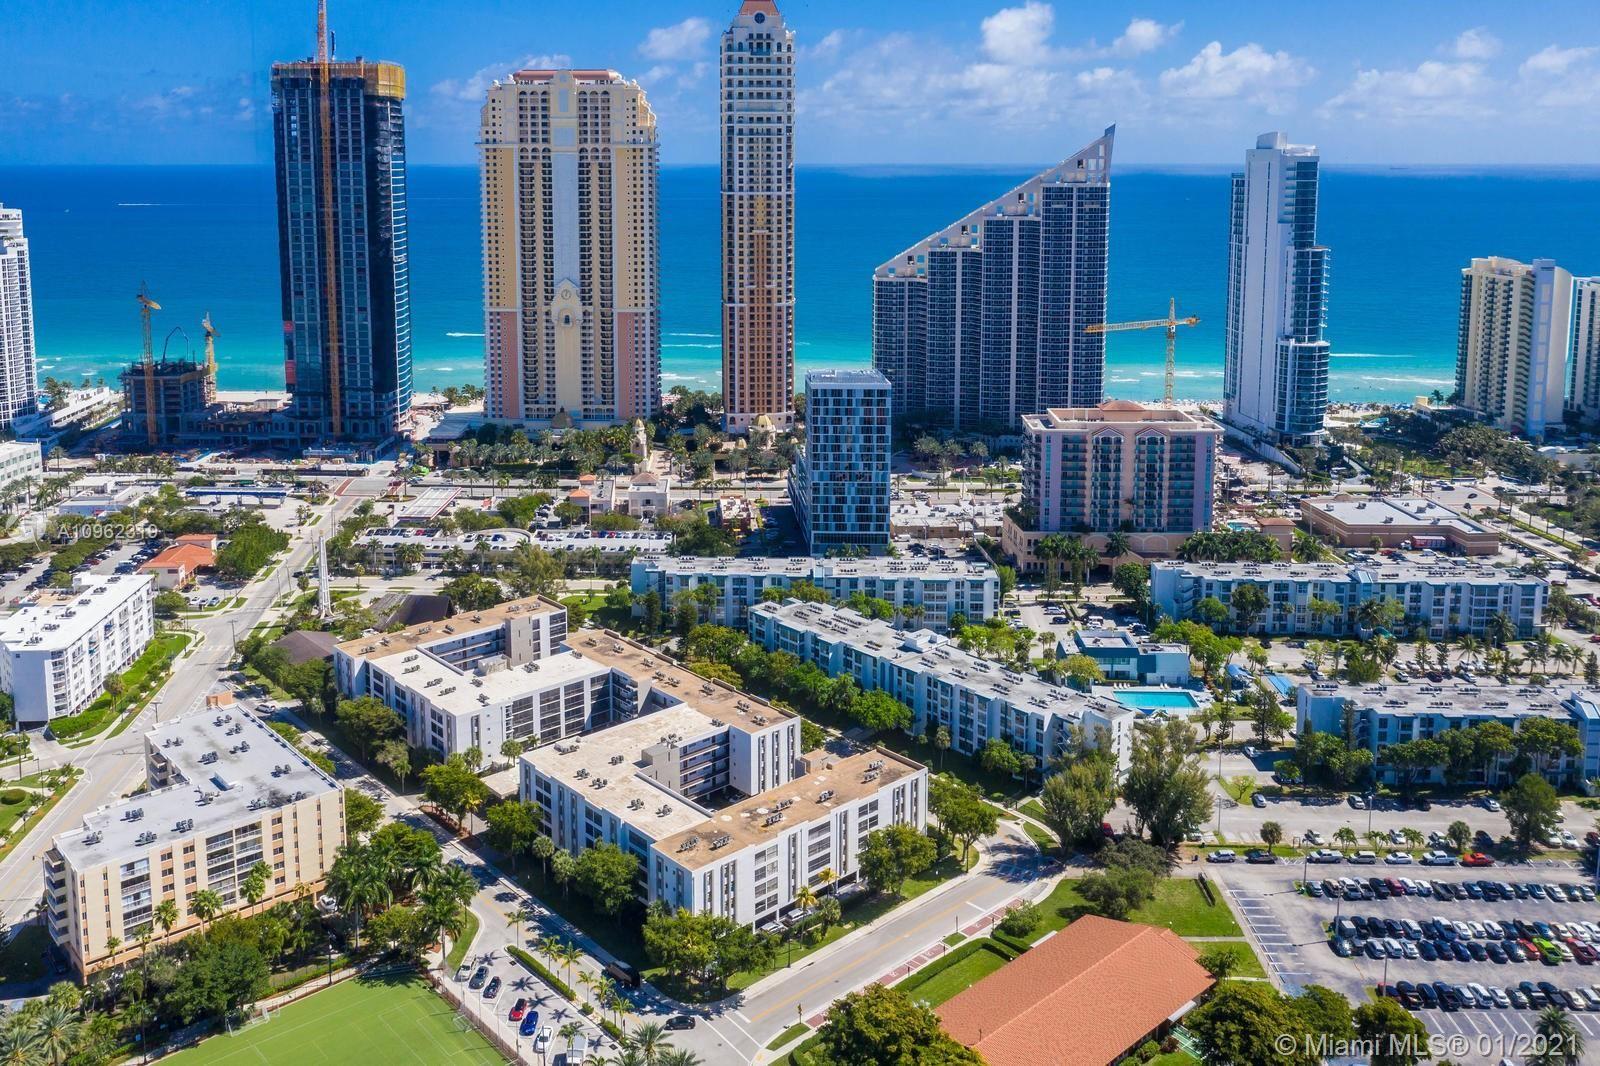 17620 Atlantic Blvd #108, Sunny Isles, FL 33160 - #: A10962319